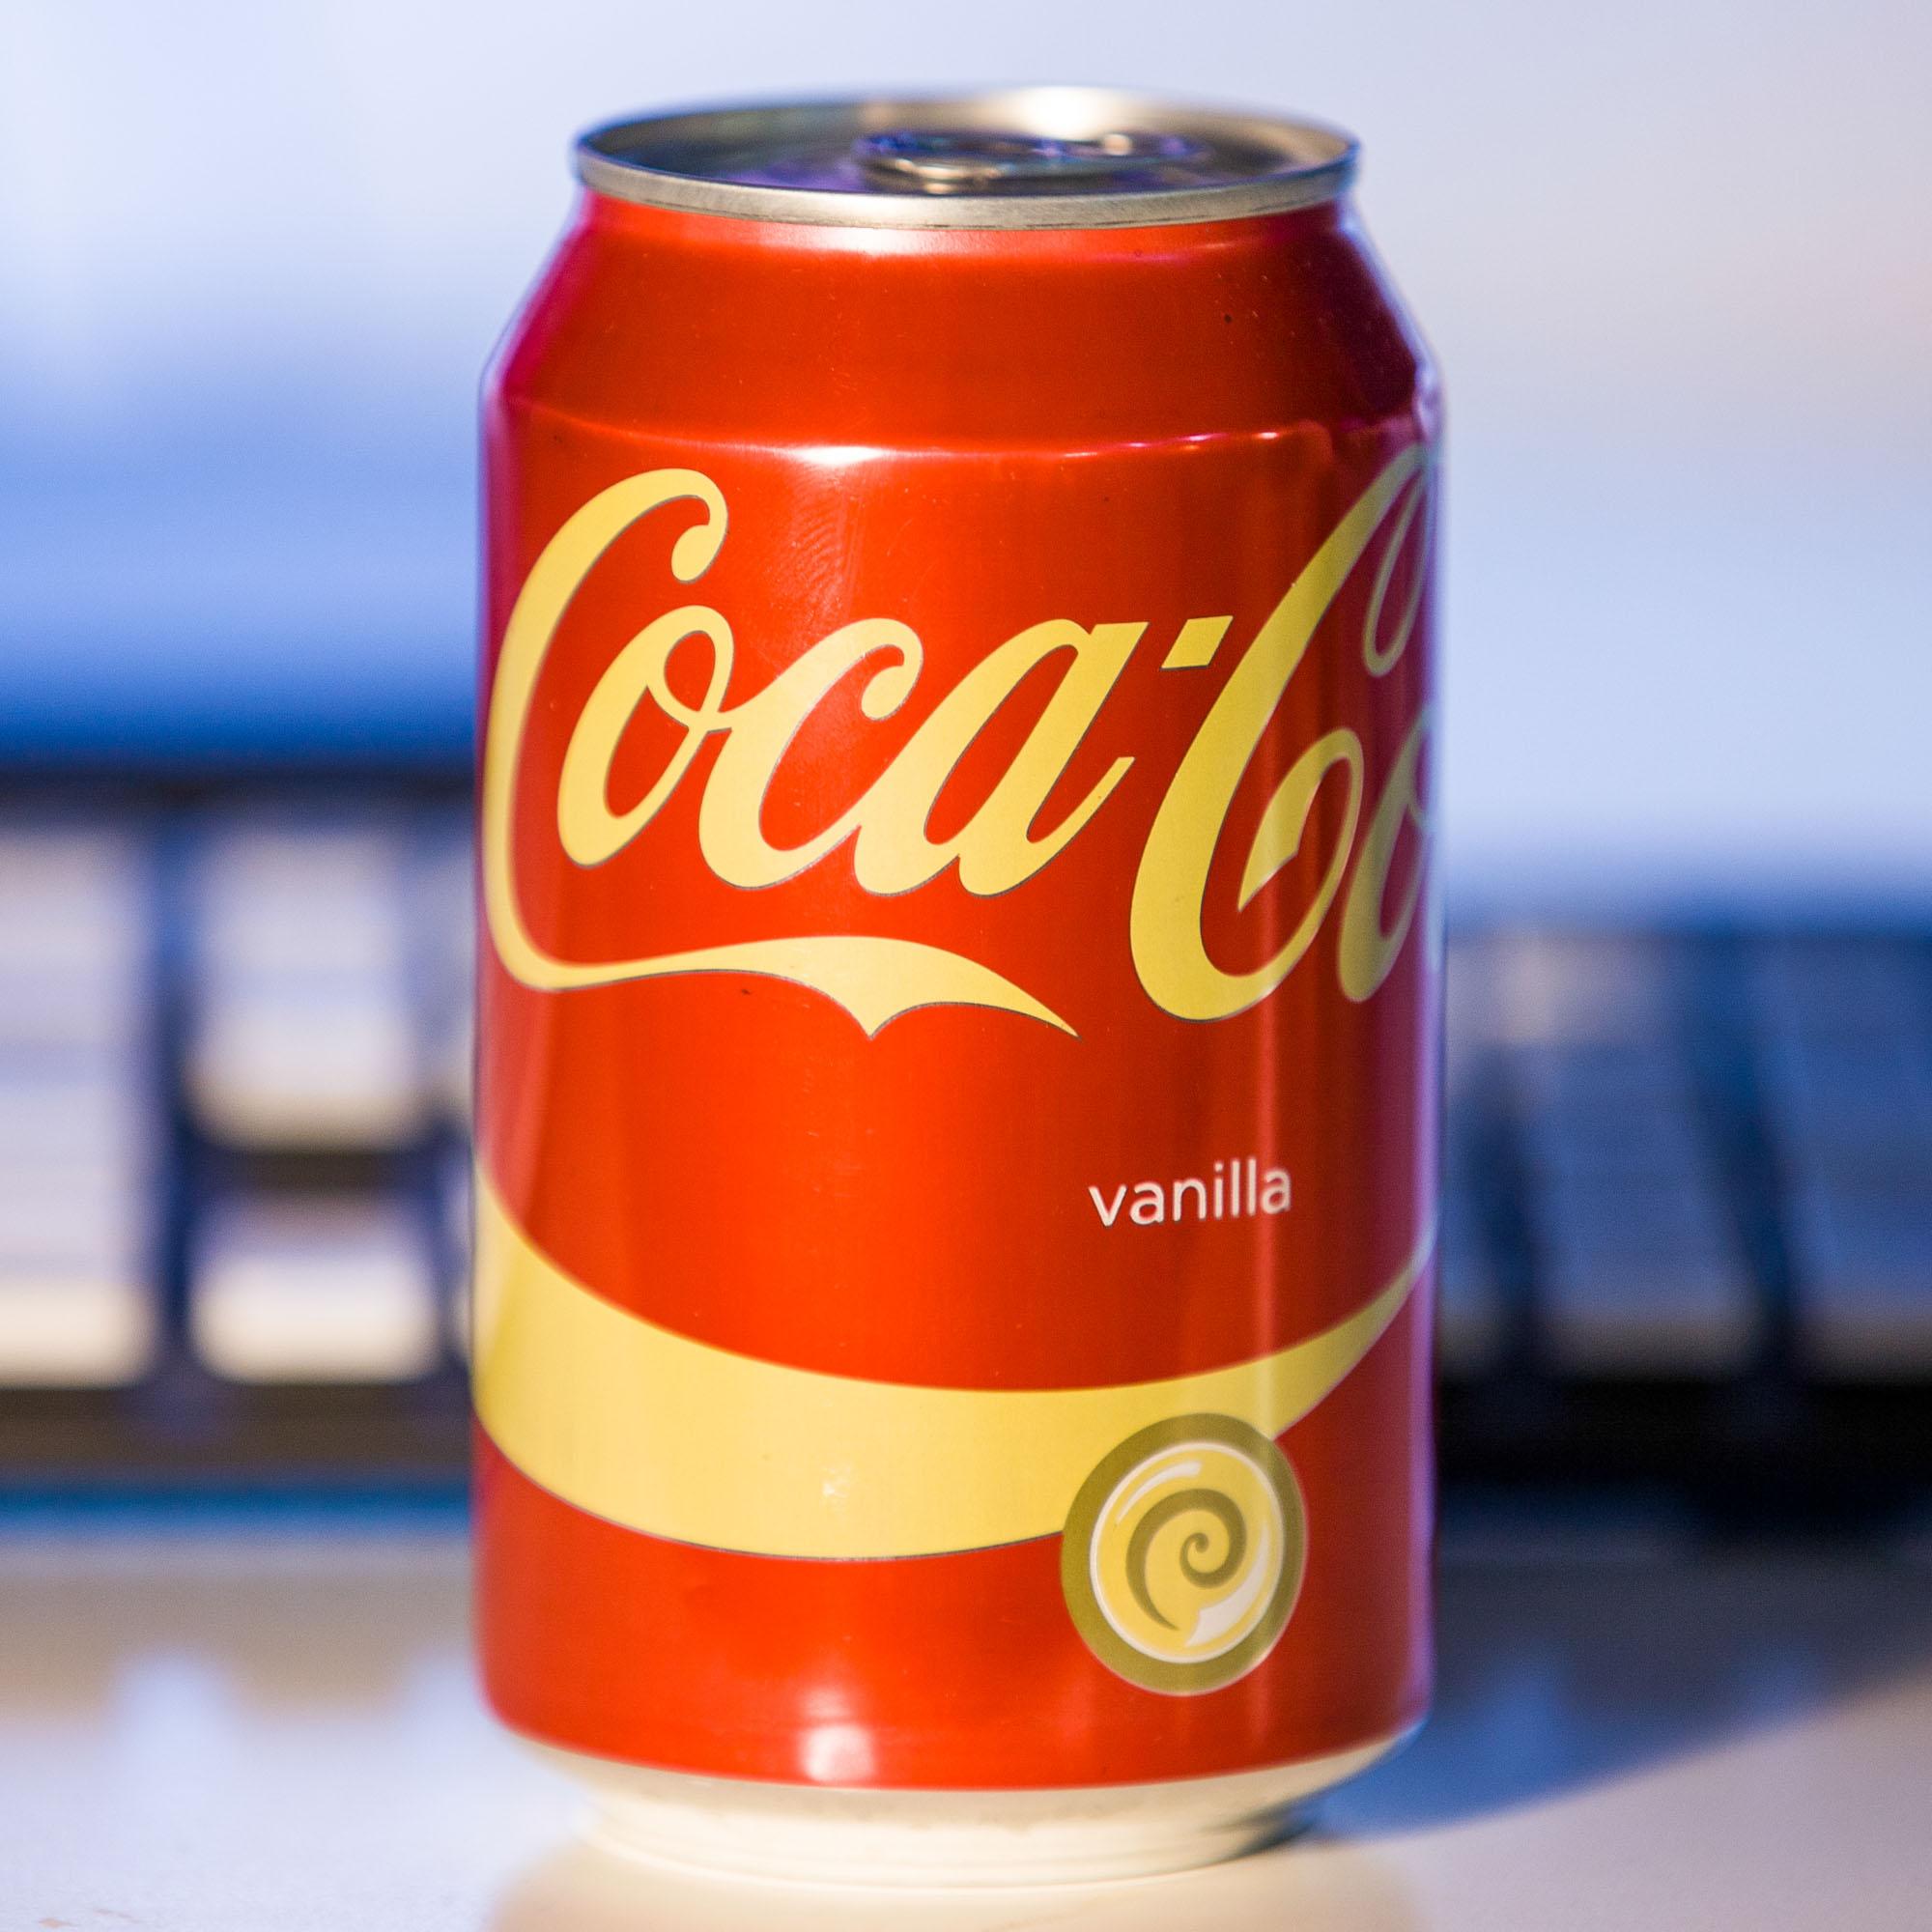 coca-cola-vanilla-photo-by-alexander-grosse-strangmann